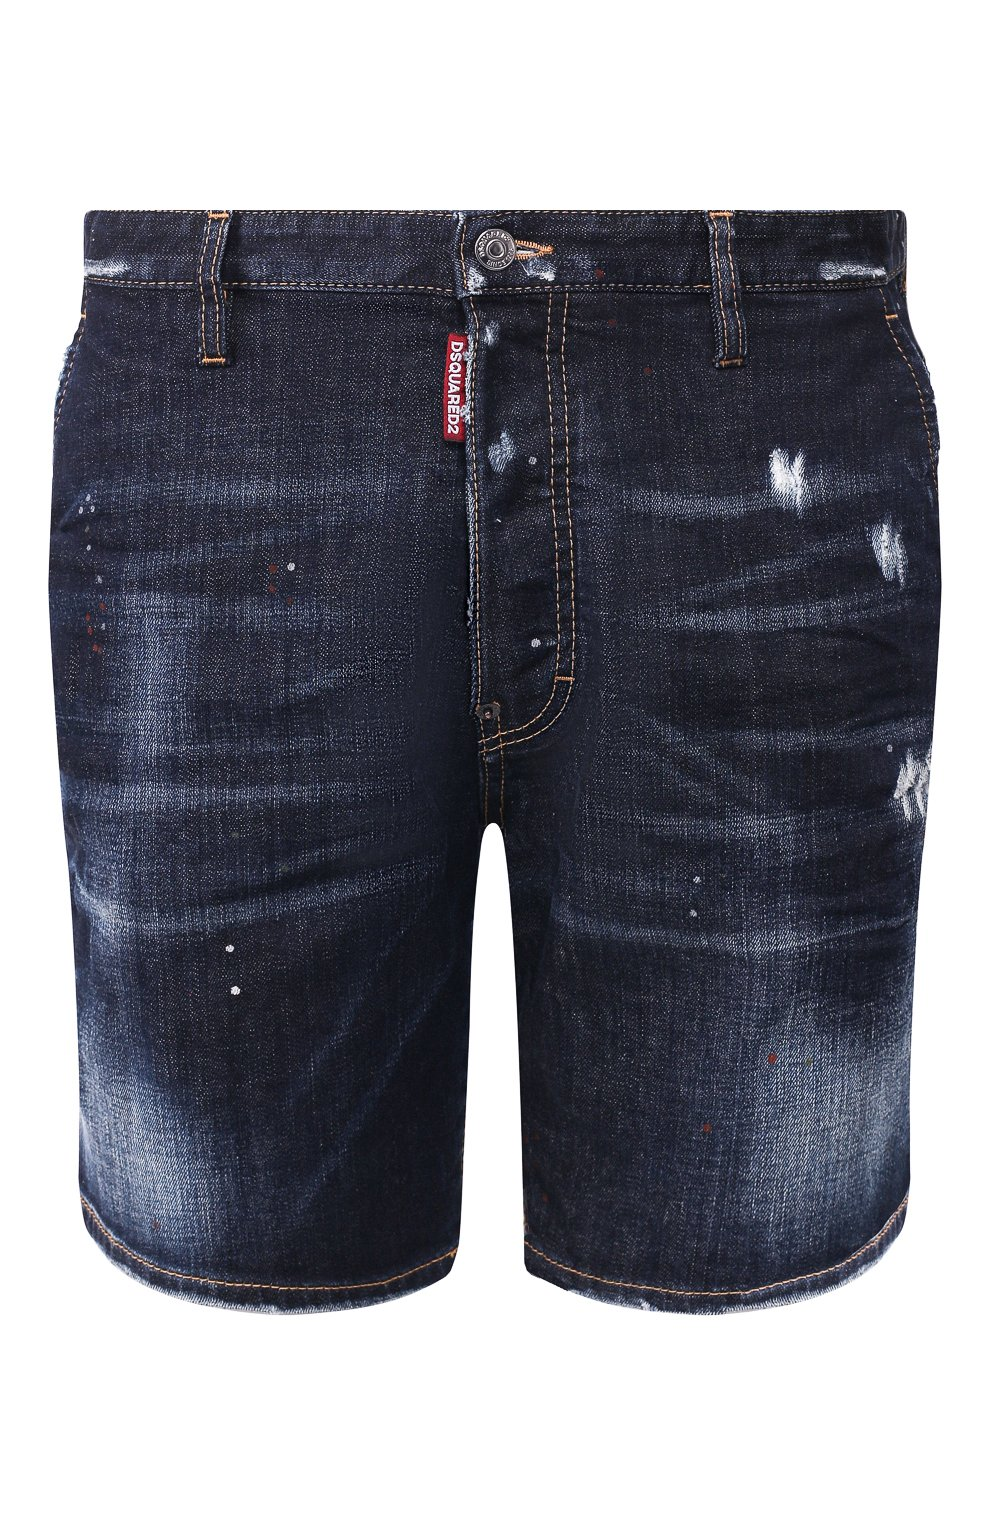 Мужские джинсовые шорты DSQUARED2 темно-синего цвета, арт. S74MU0576/S30664   Фото 1